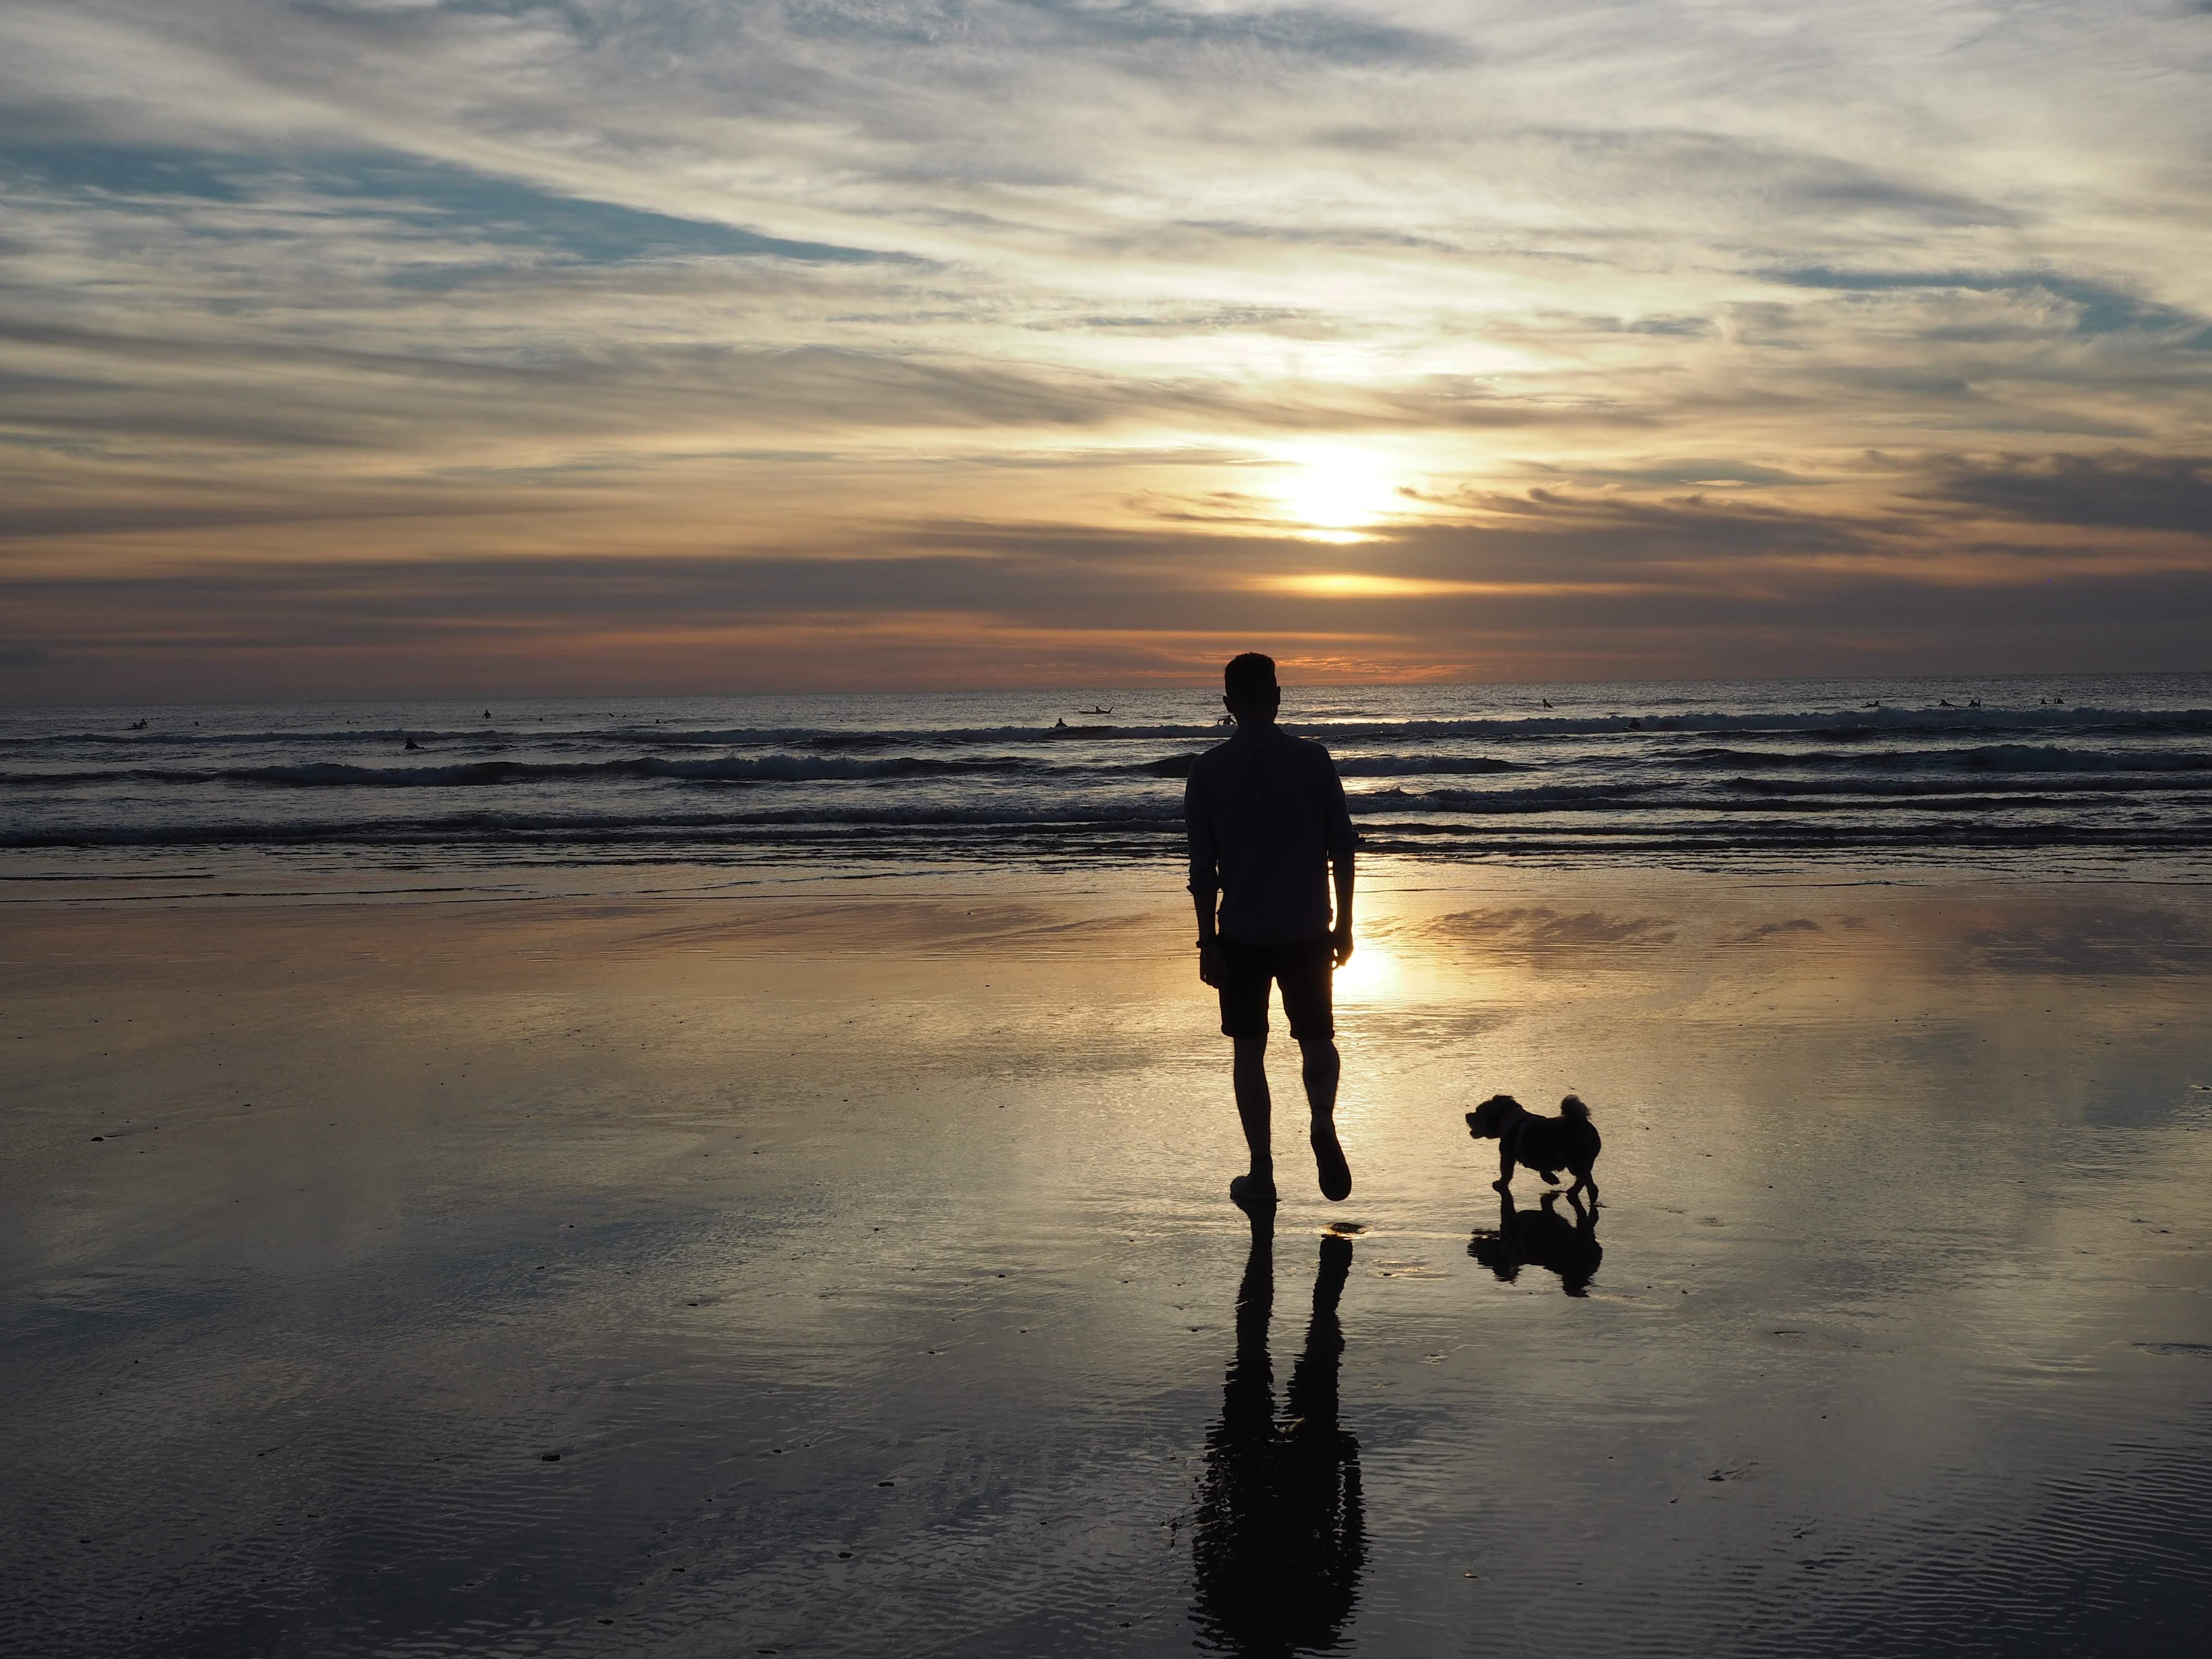 Sunset on Perranporth beach